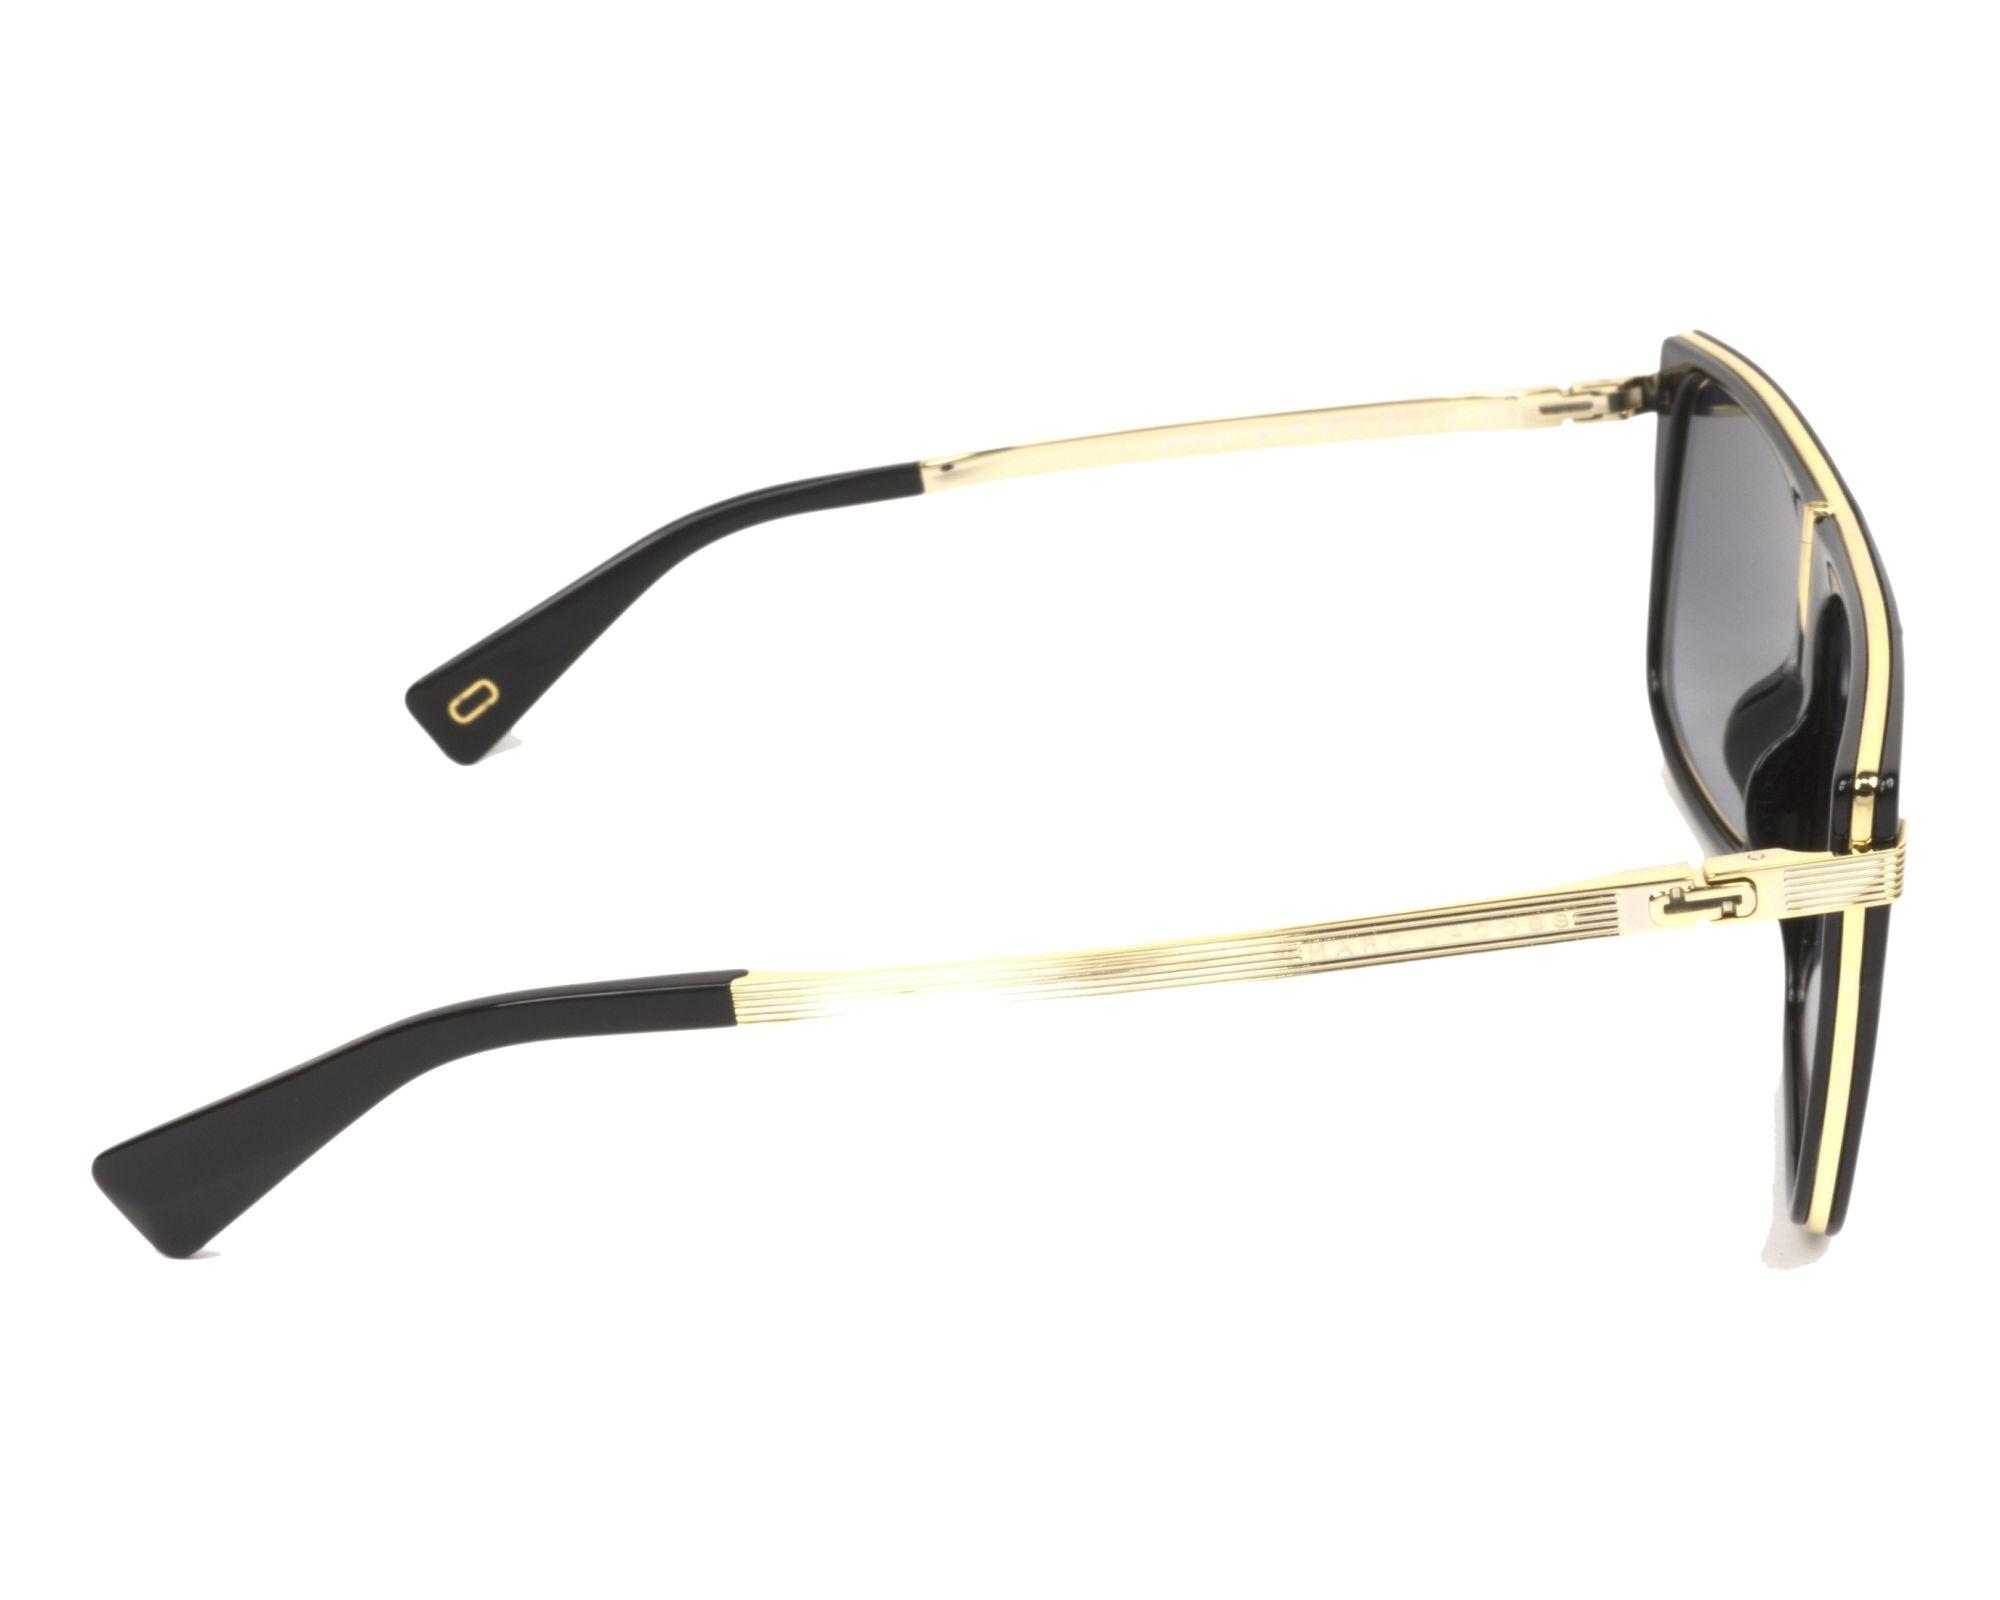 ... Sunglasses Marc Jacobs MARC-242-S 2M29O 59-14 Black Gold hot new ... 84a1d1777046